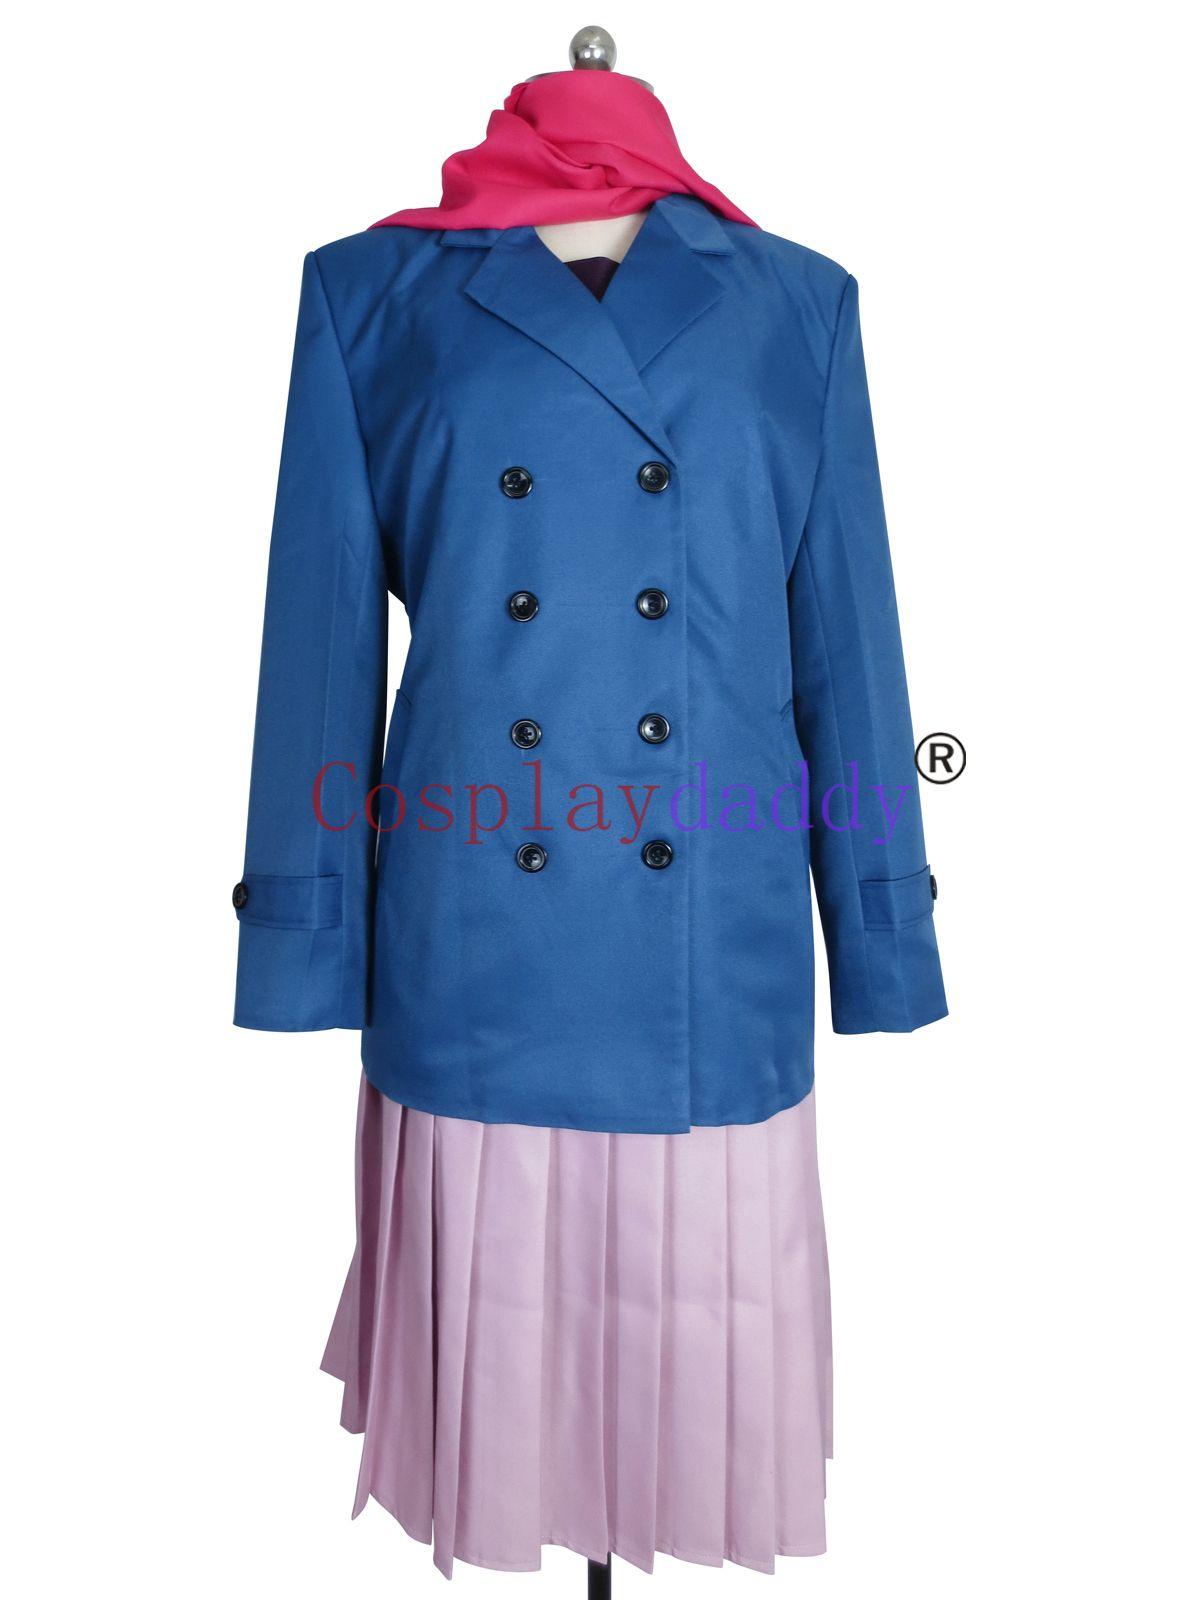 Noragami Cosplay Hiyori Iki Mantel Uniform Full Set Kostüm H008